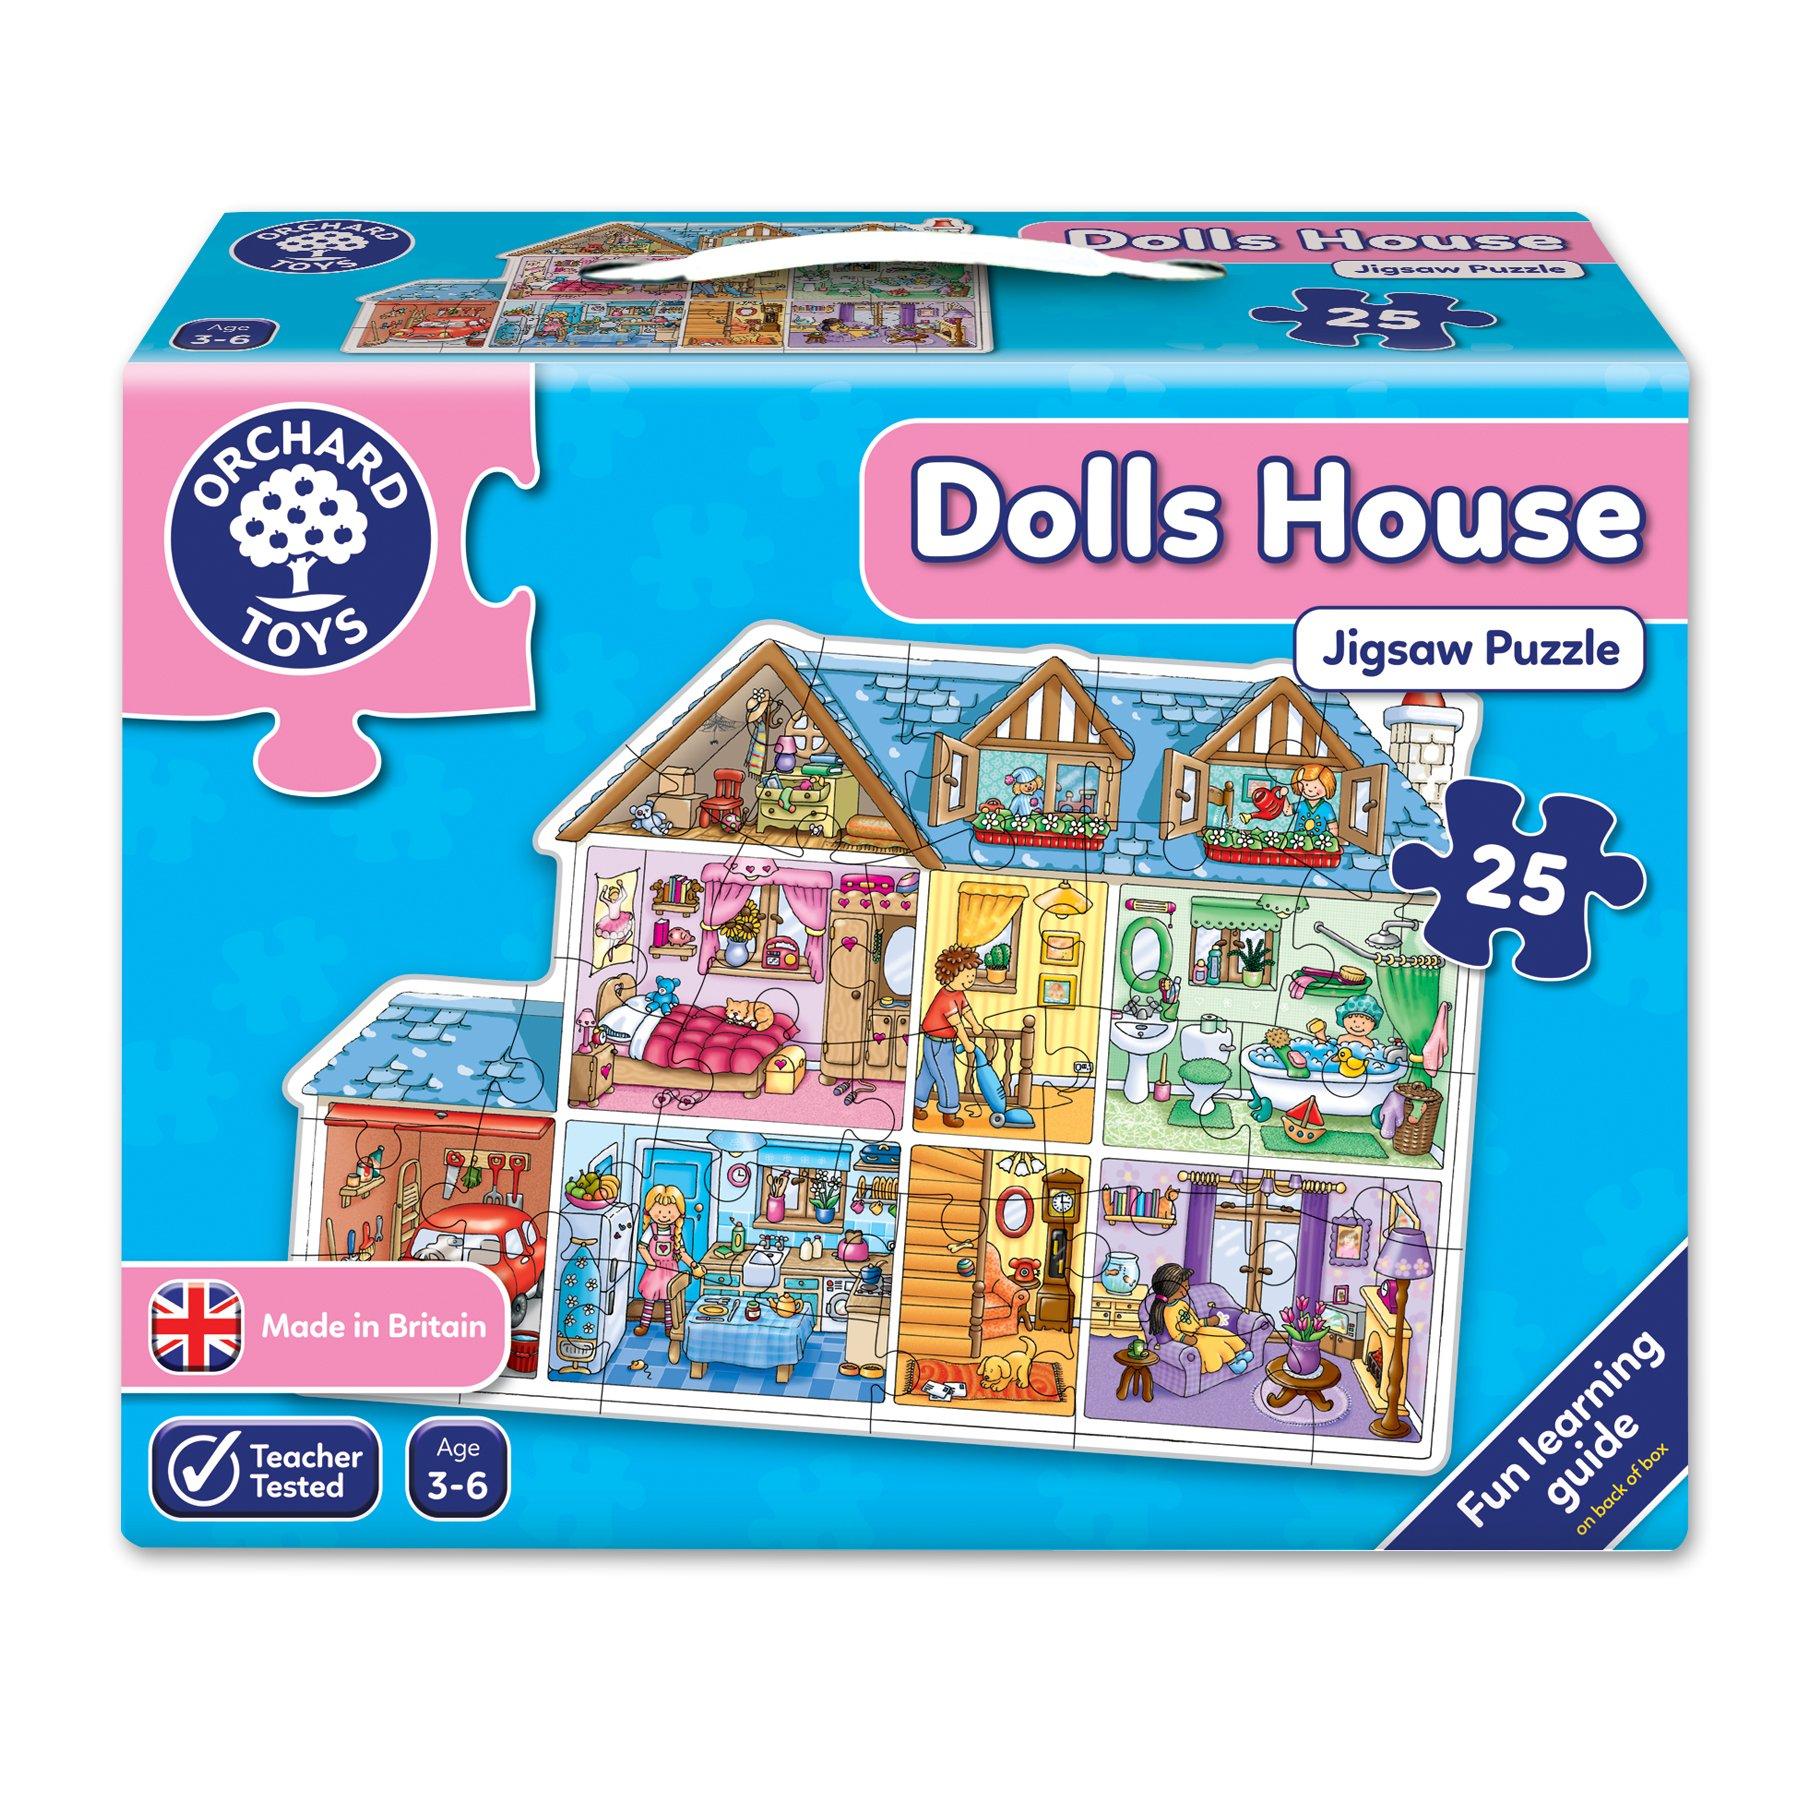 Orchard_Toys - Puzle de la casa de muñecas product image